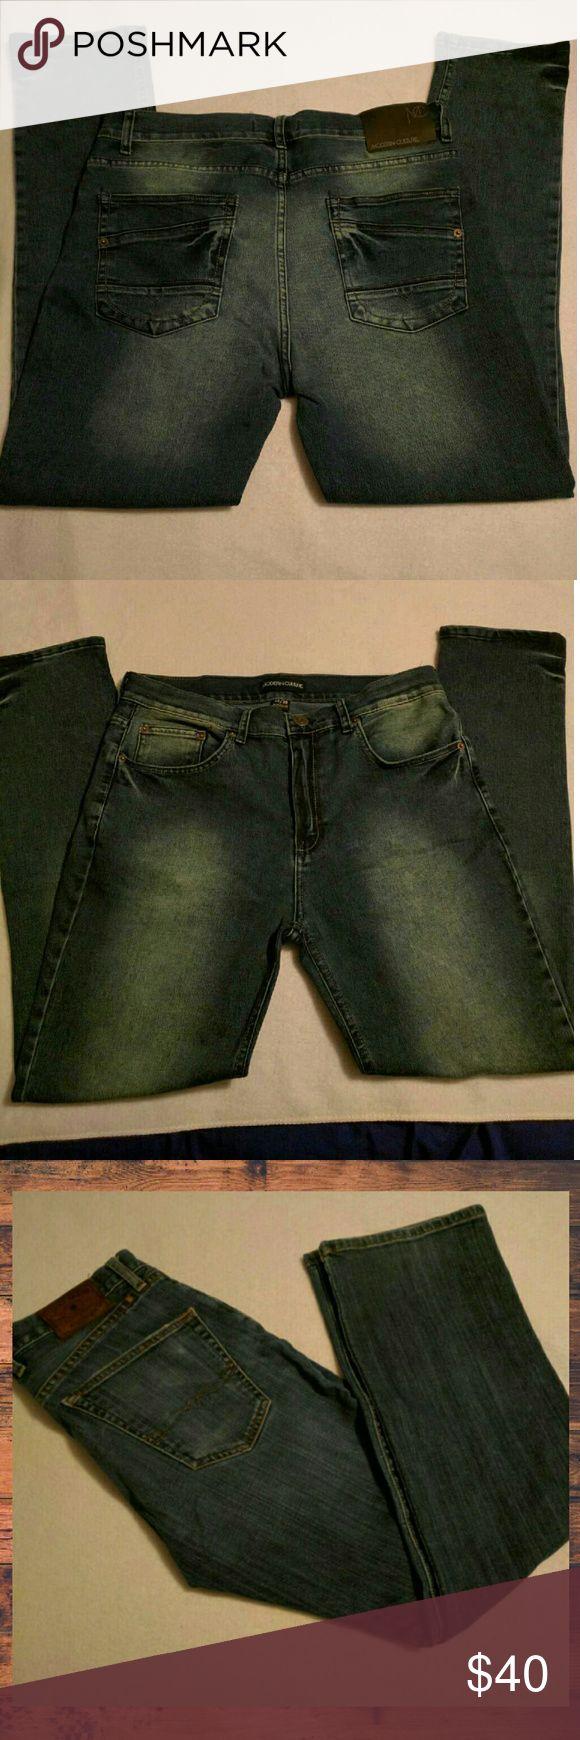 NWOT- men's modern culture skinny jeans 34/30 Brand New without tags- men's modern culture skinny jeans size 34/30 modern culture Jeans Skinny